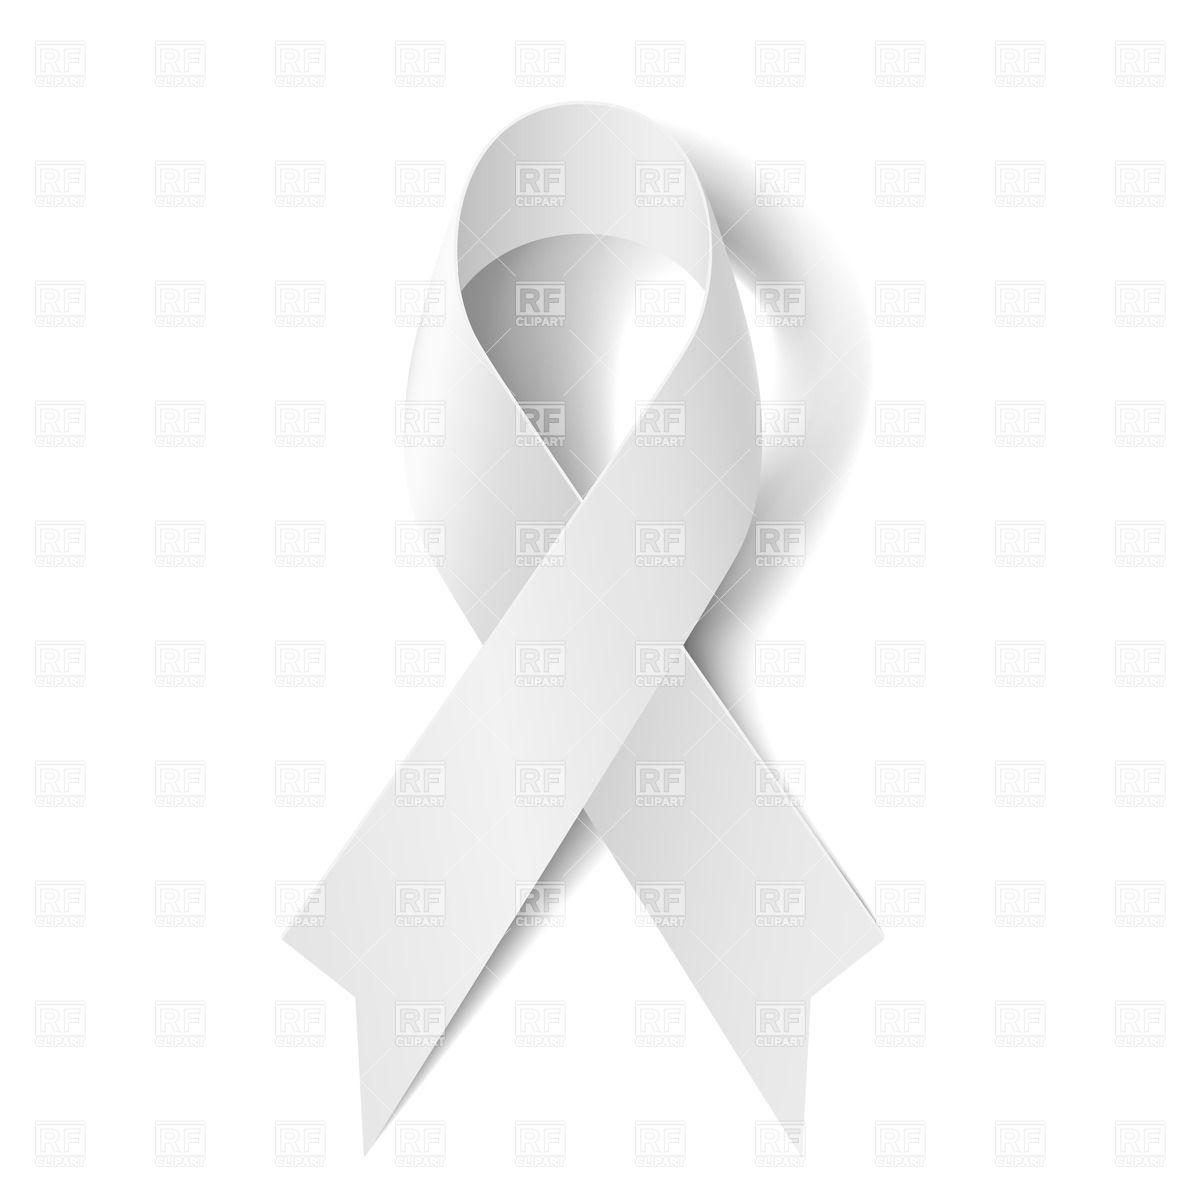 1200x1200 White Awareness Ribbon On White Background Vector Image Vector